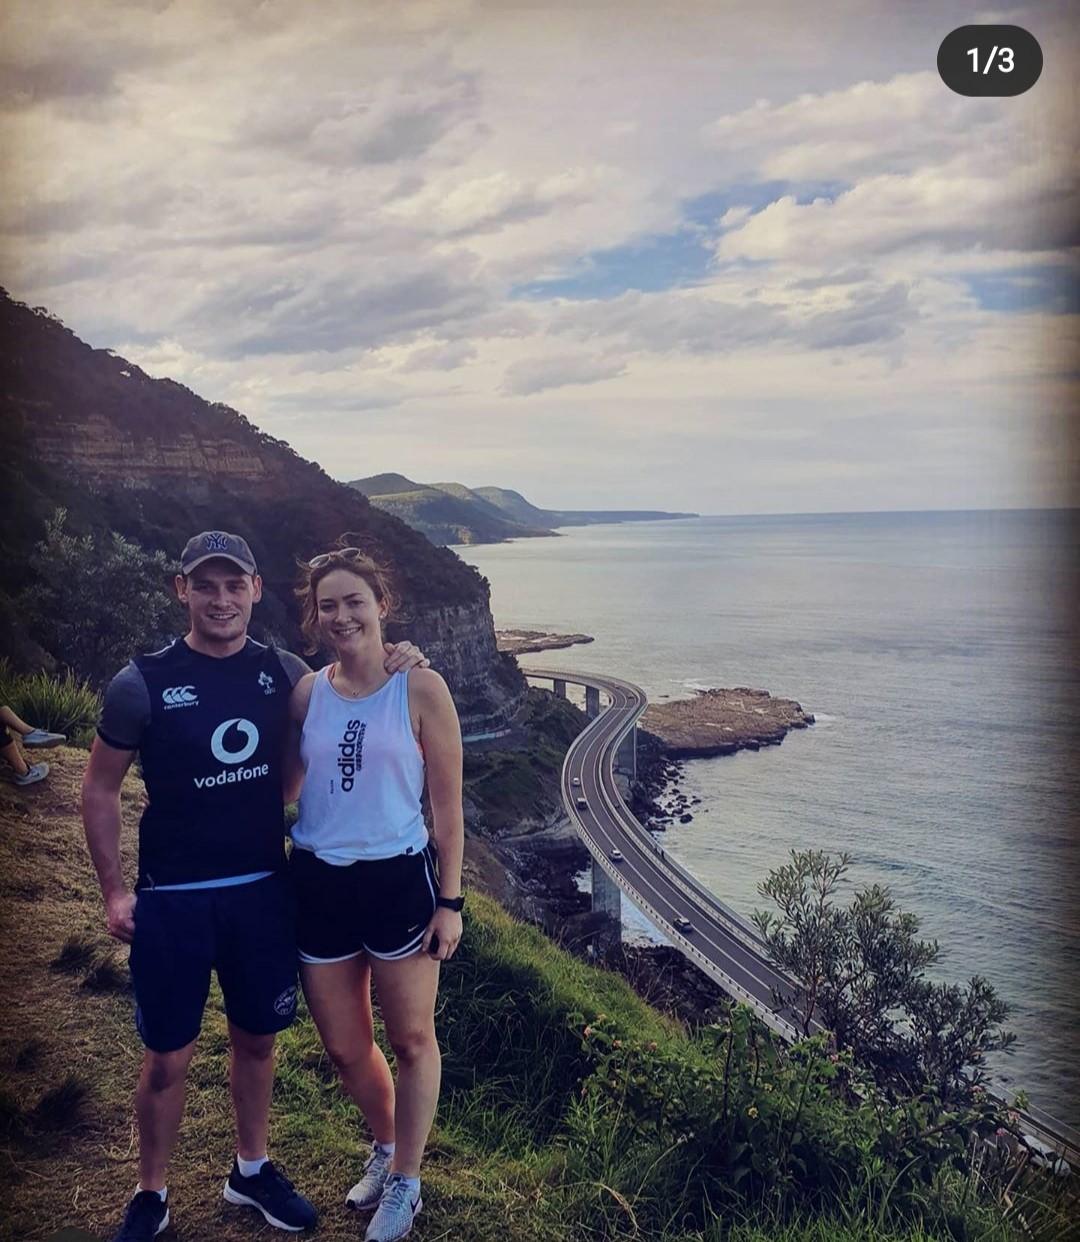 James and Sarah along the Sea Cliff Bridge south of Sydney